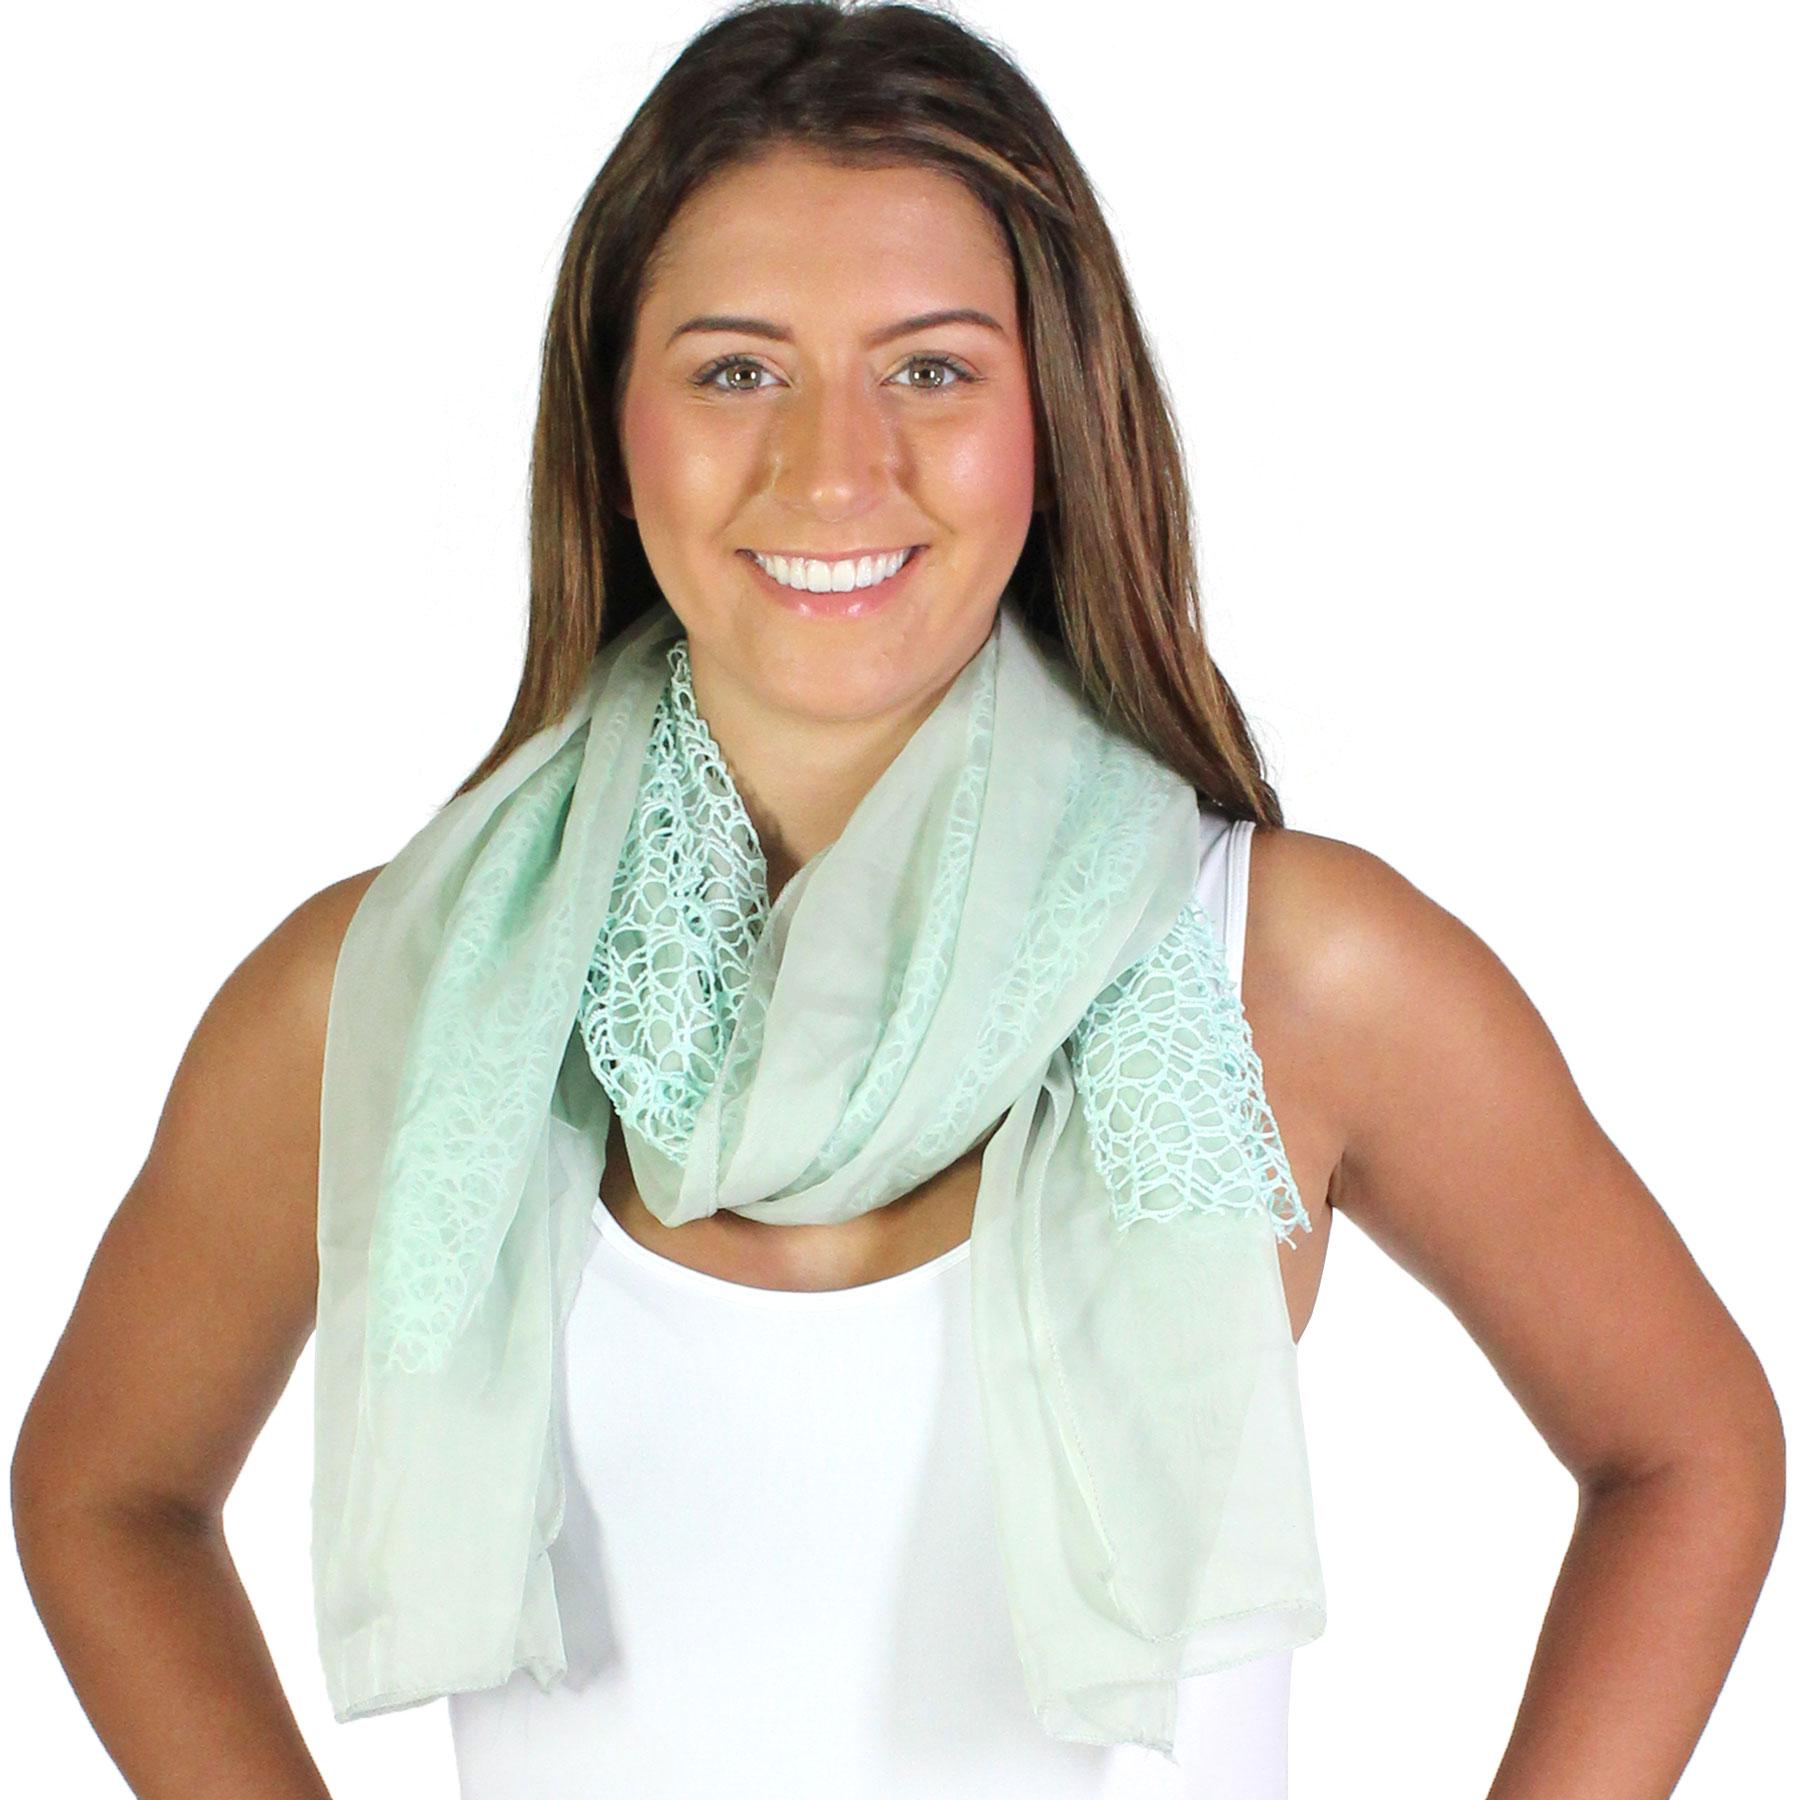 Oblong Scarves - Crochet Chiffon 3165*